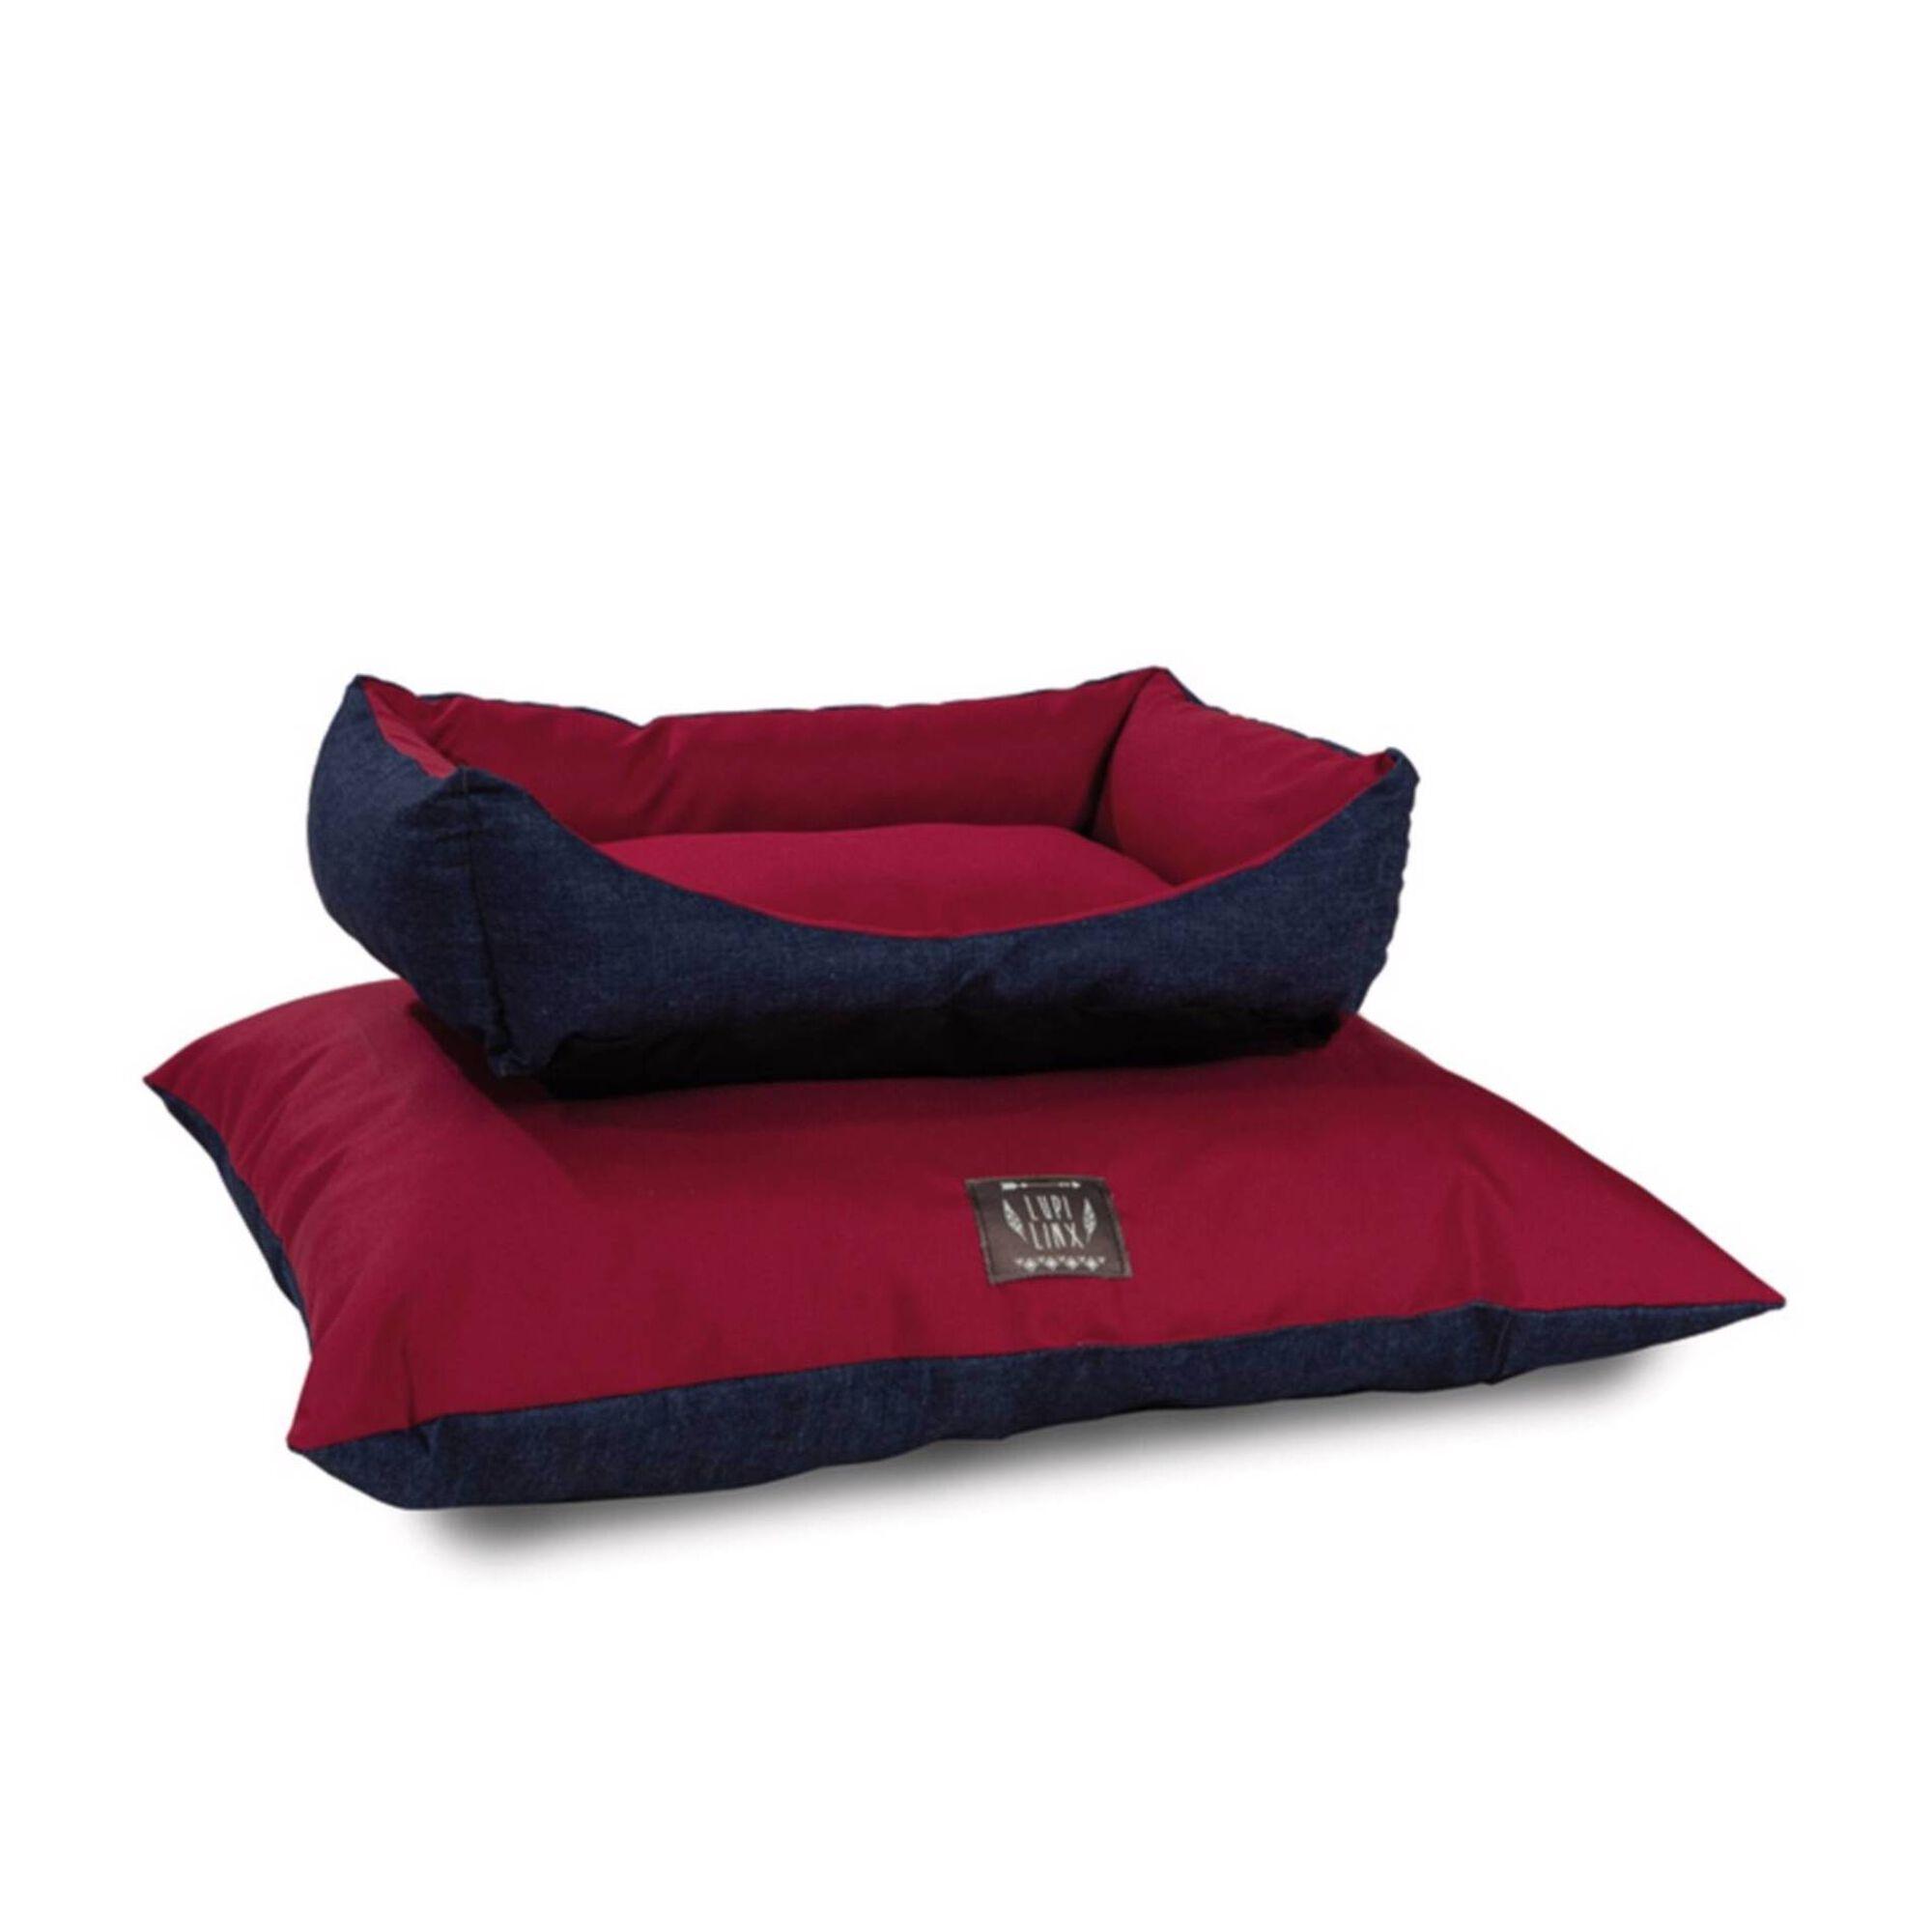 Cama Sofá para Cão Oval Denim S/M